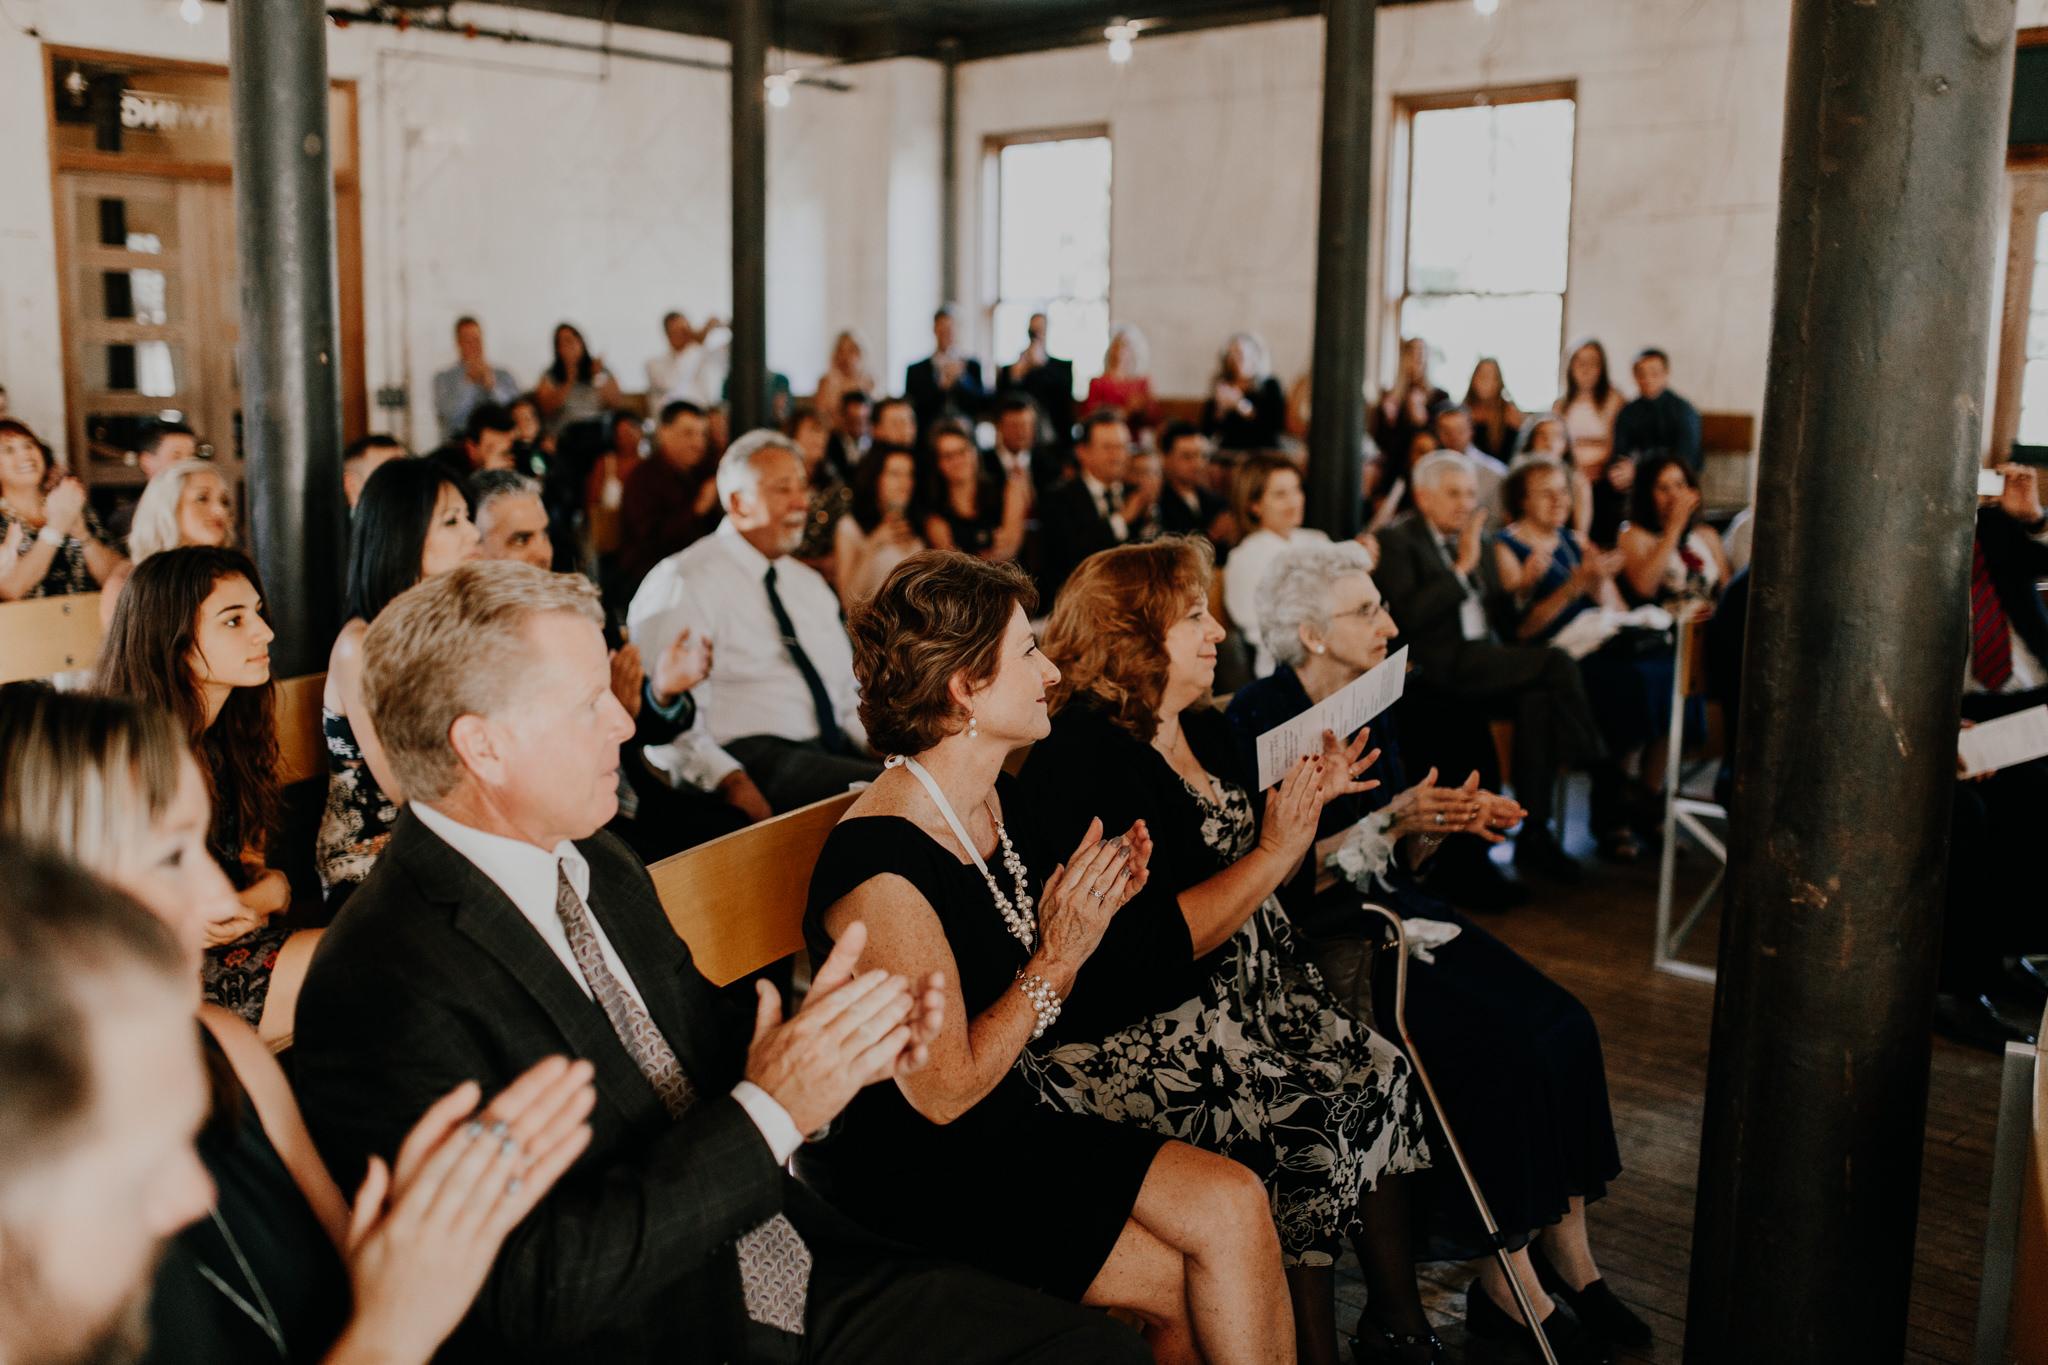 wedding-headlands-center-for-the-arts-sausalito-86.jpg